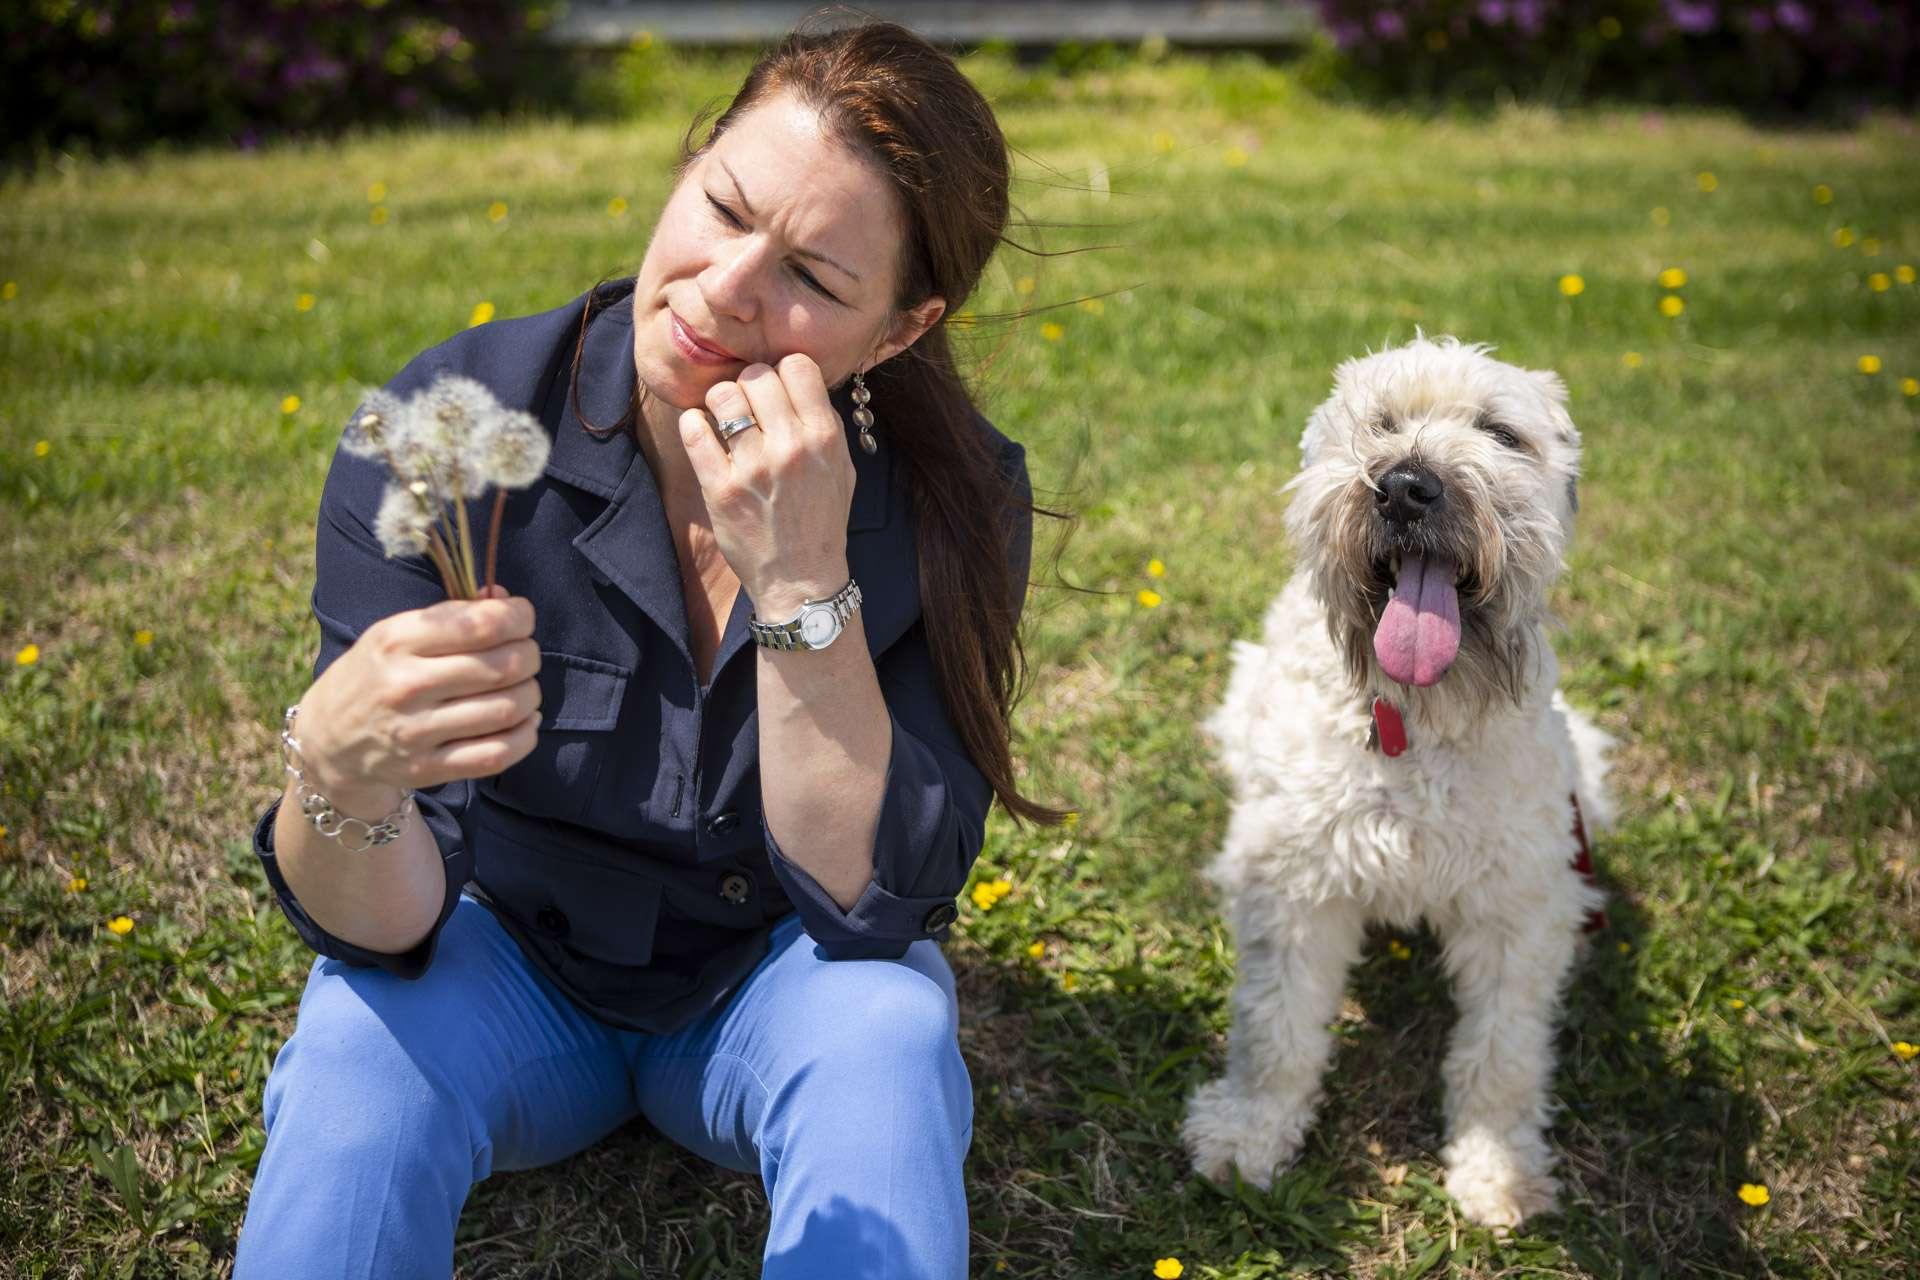 lawn-weeds-dog-customer-8